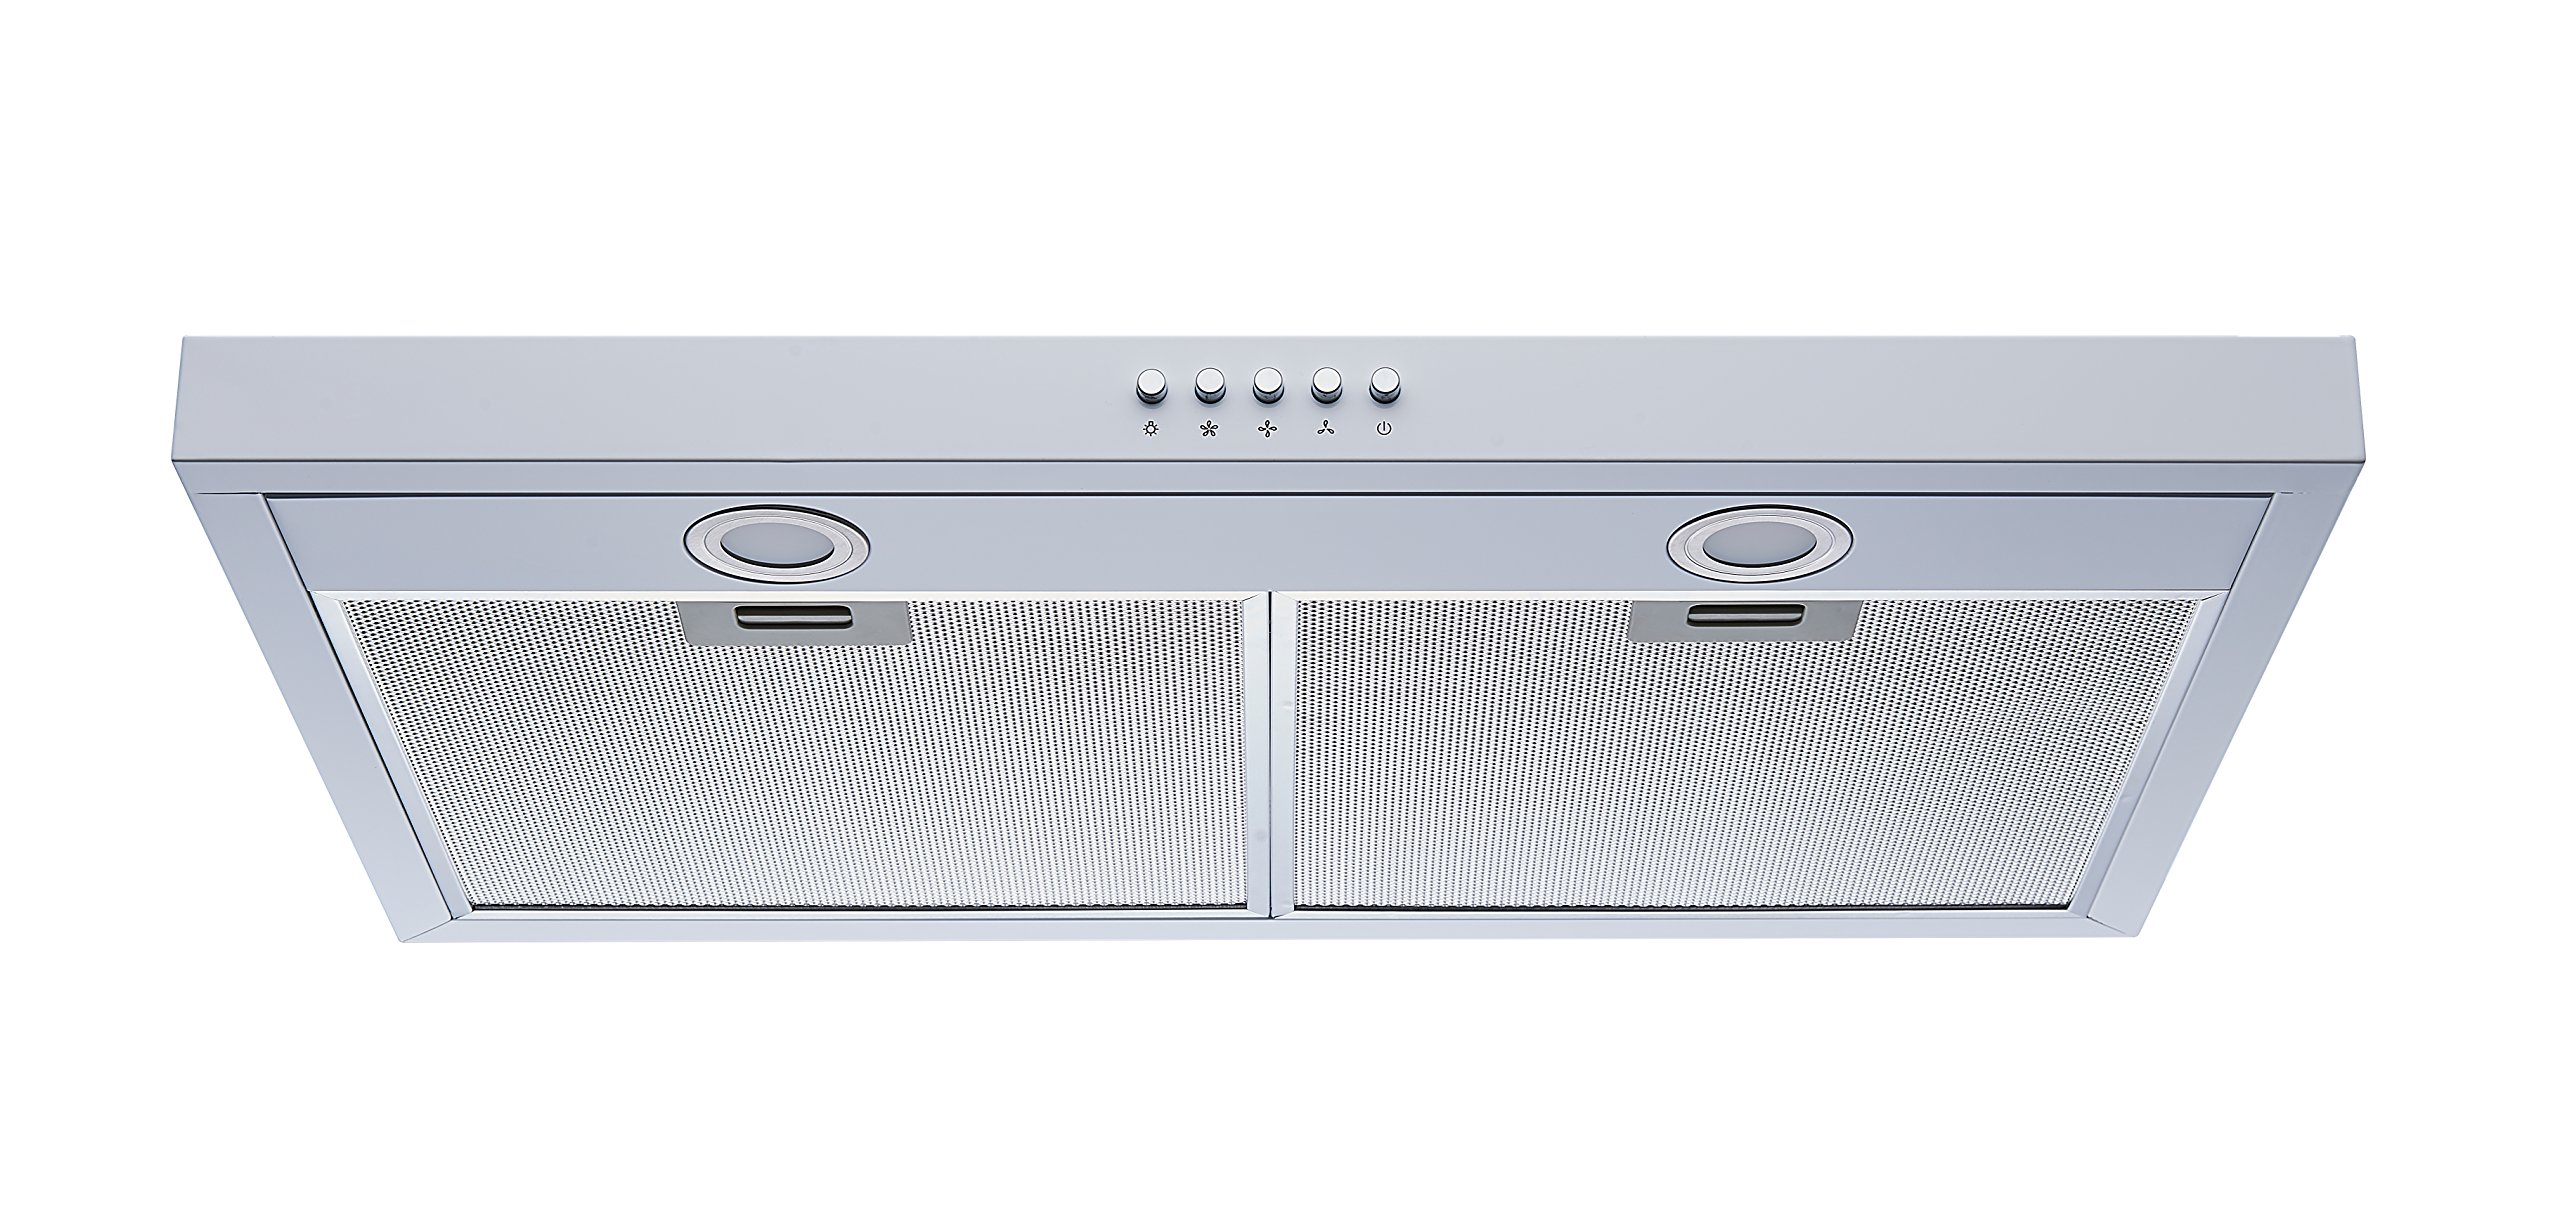 Winflo 30'' Under Cabinet White Color European Slim Design Kitchen Range Hood Push Button Control Included Dishwasher-Safe Aluminum Filters and LED Lights